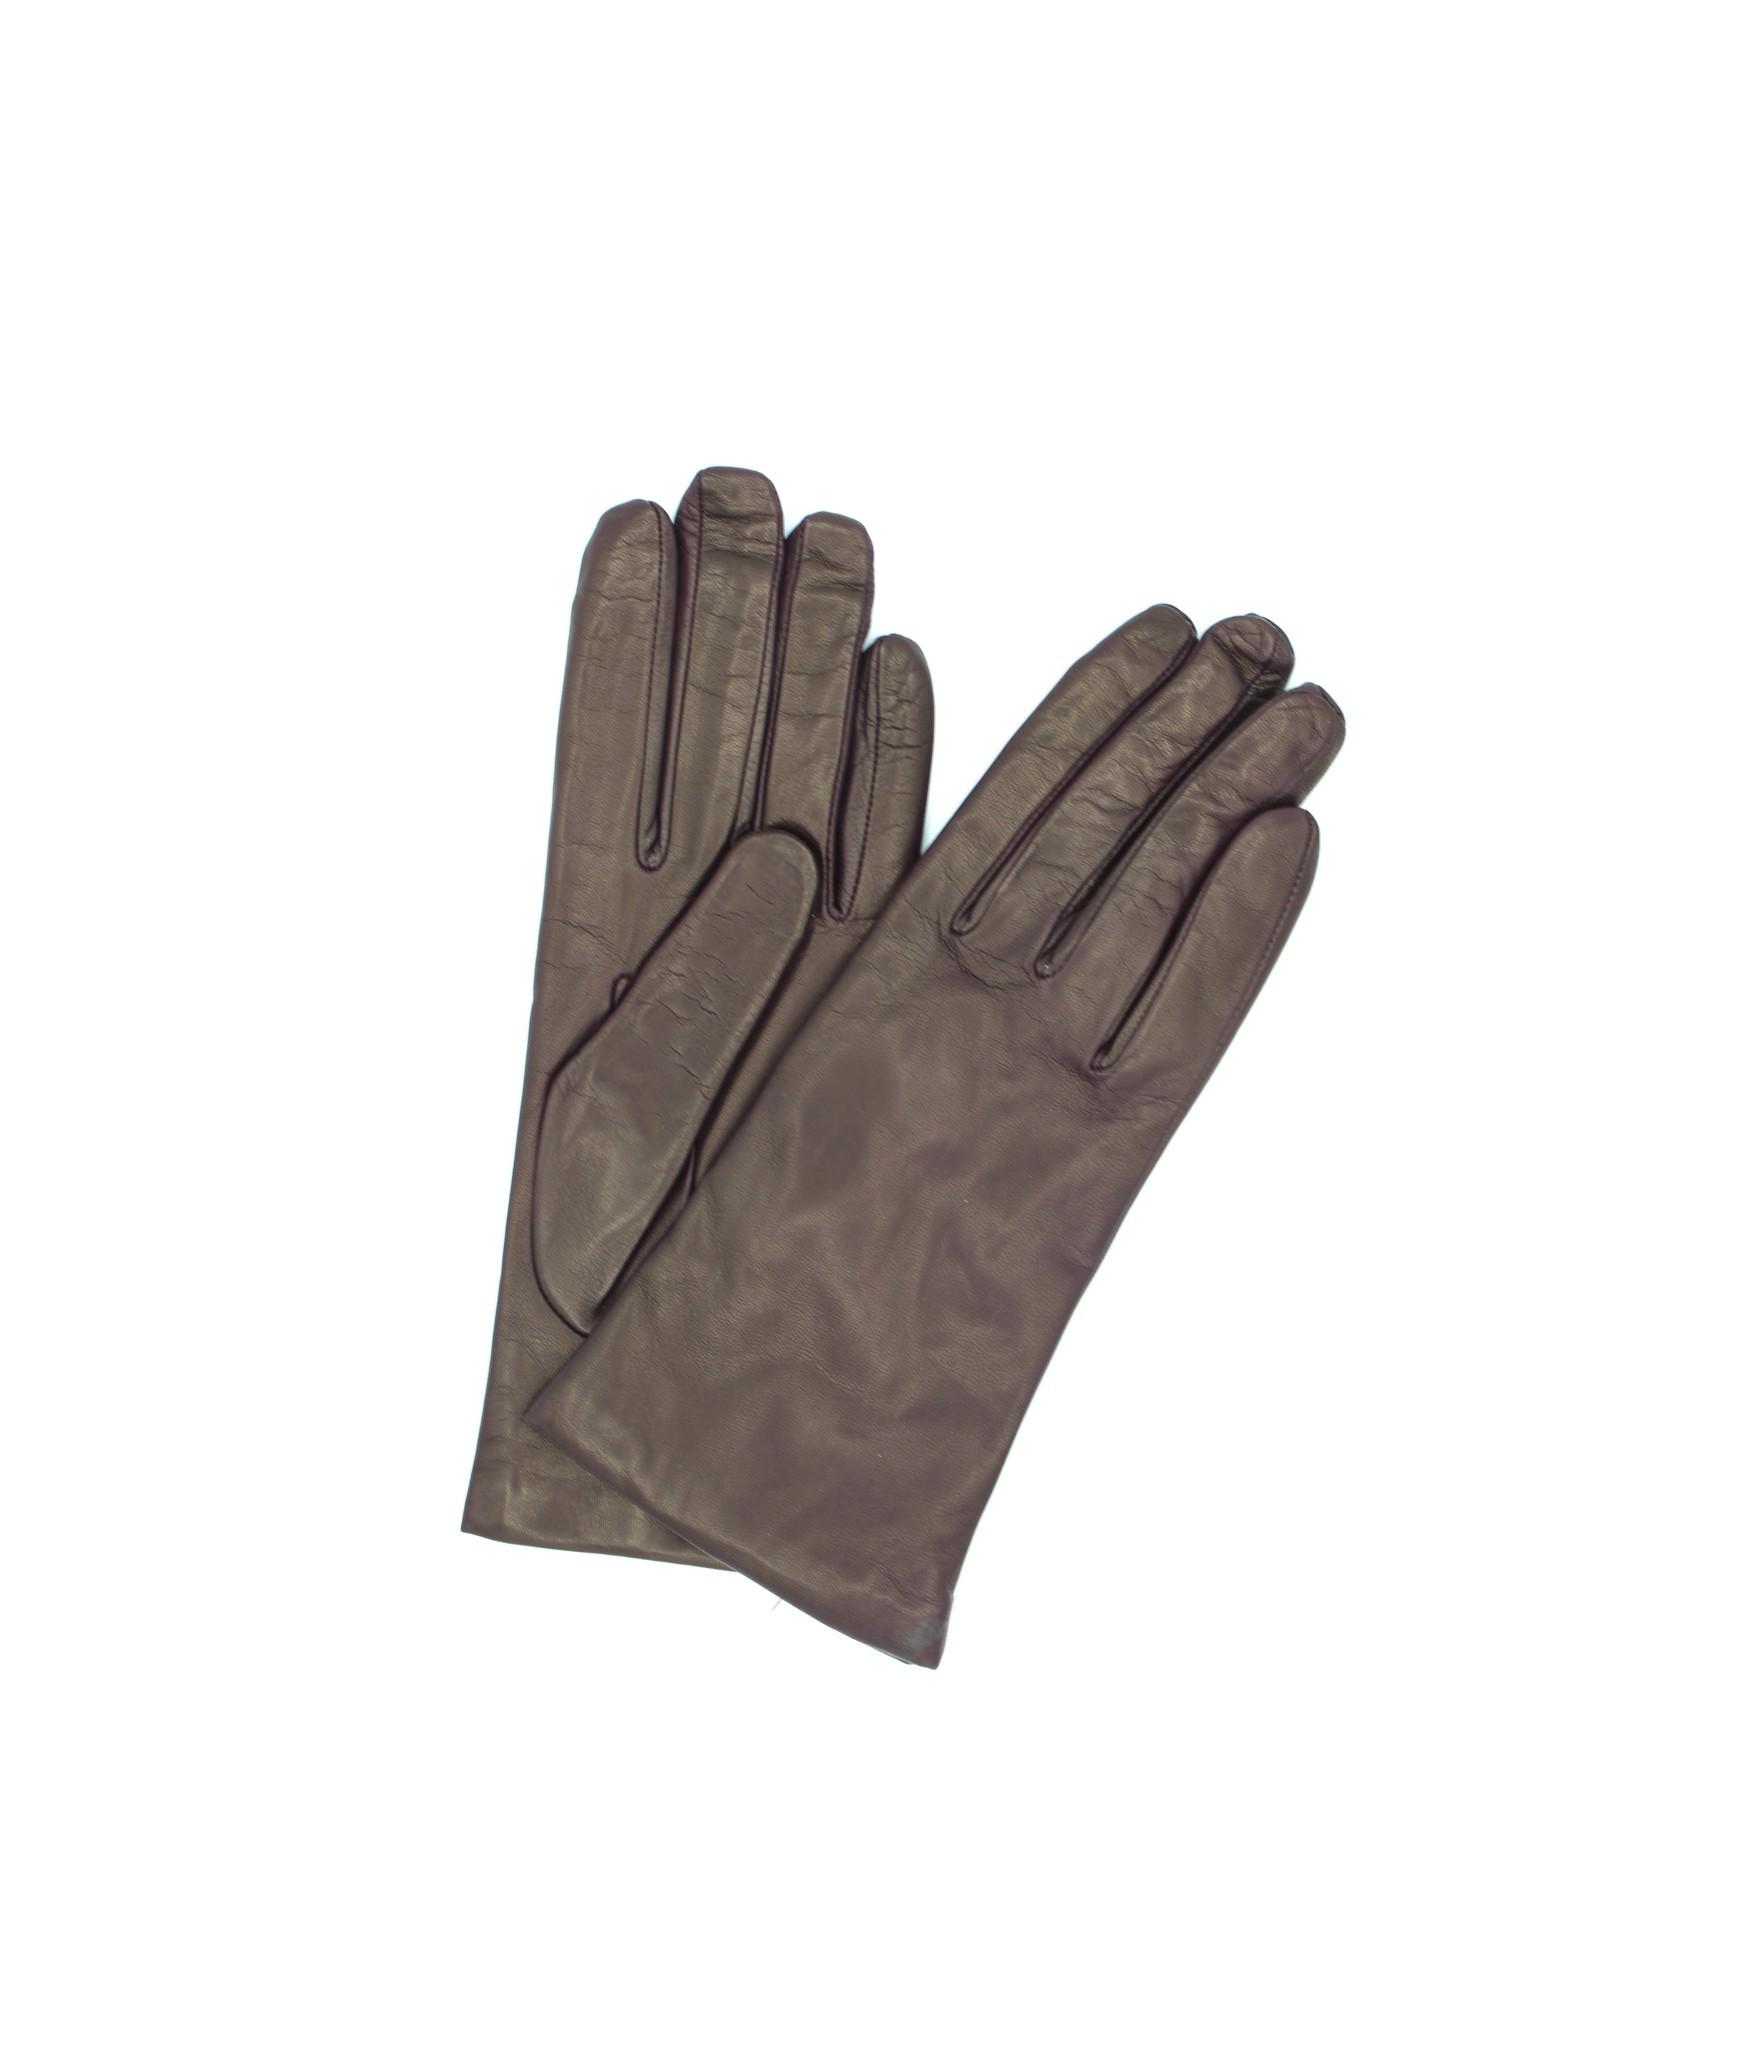 Nappa leather gloves Cashmere lined Bordeaux Sermoneta Gloves